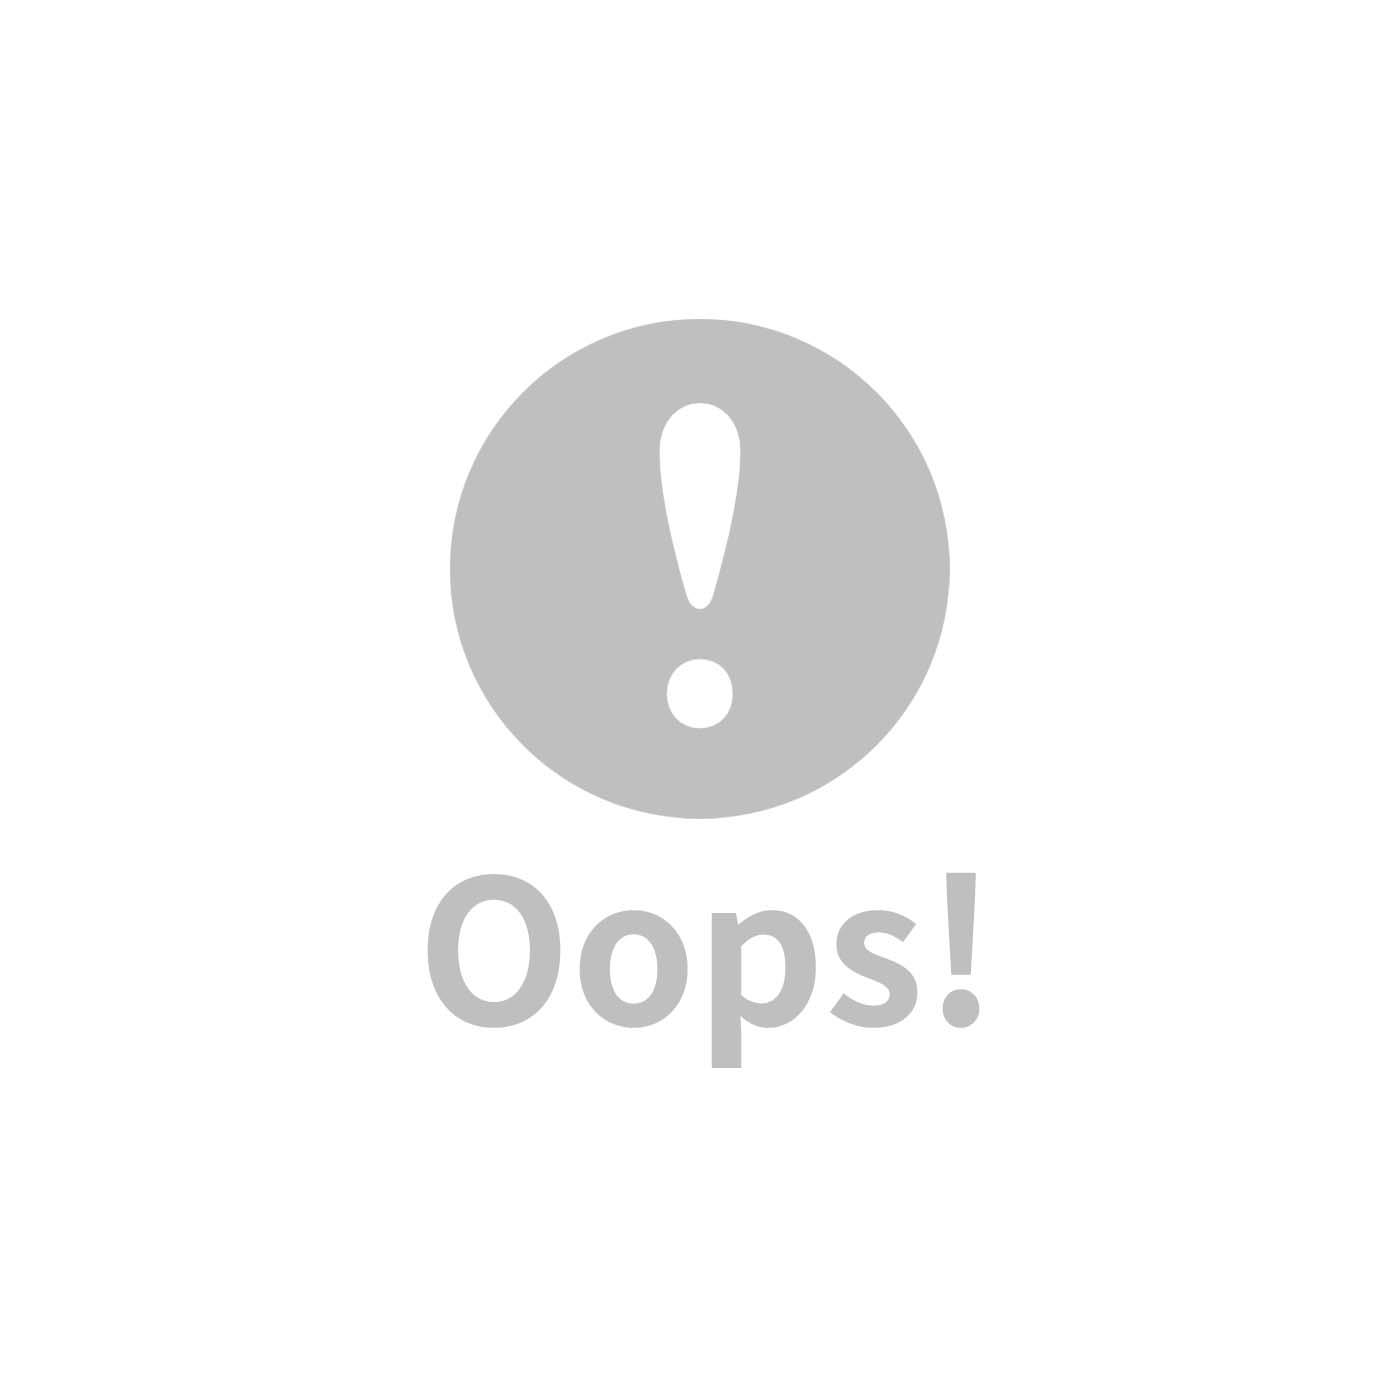 global affairs 童話手工編織安撫搖鈴_林地系列(小綿羊)